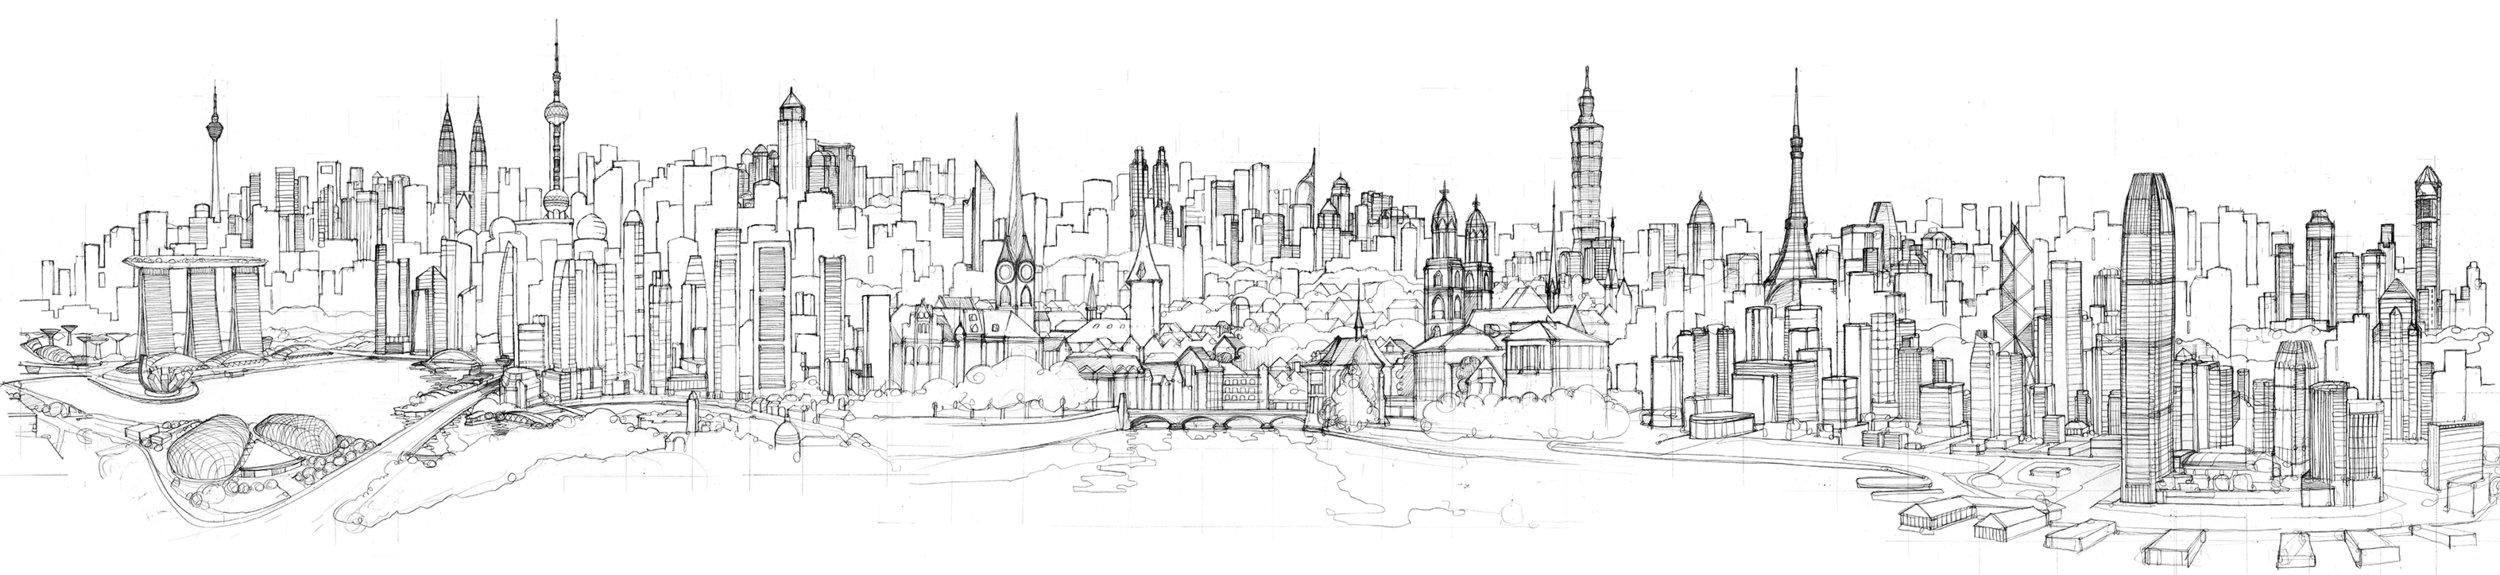 final sketch2 (3).jpg